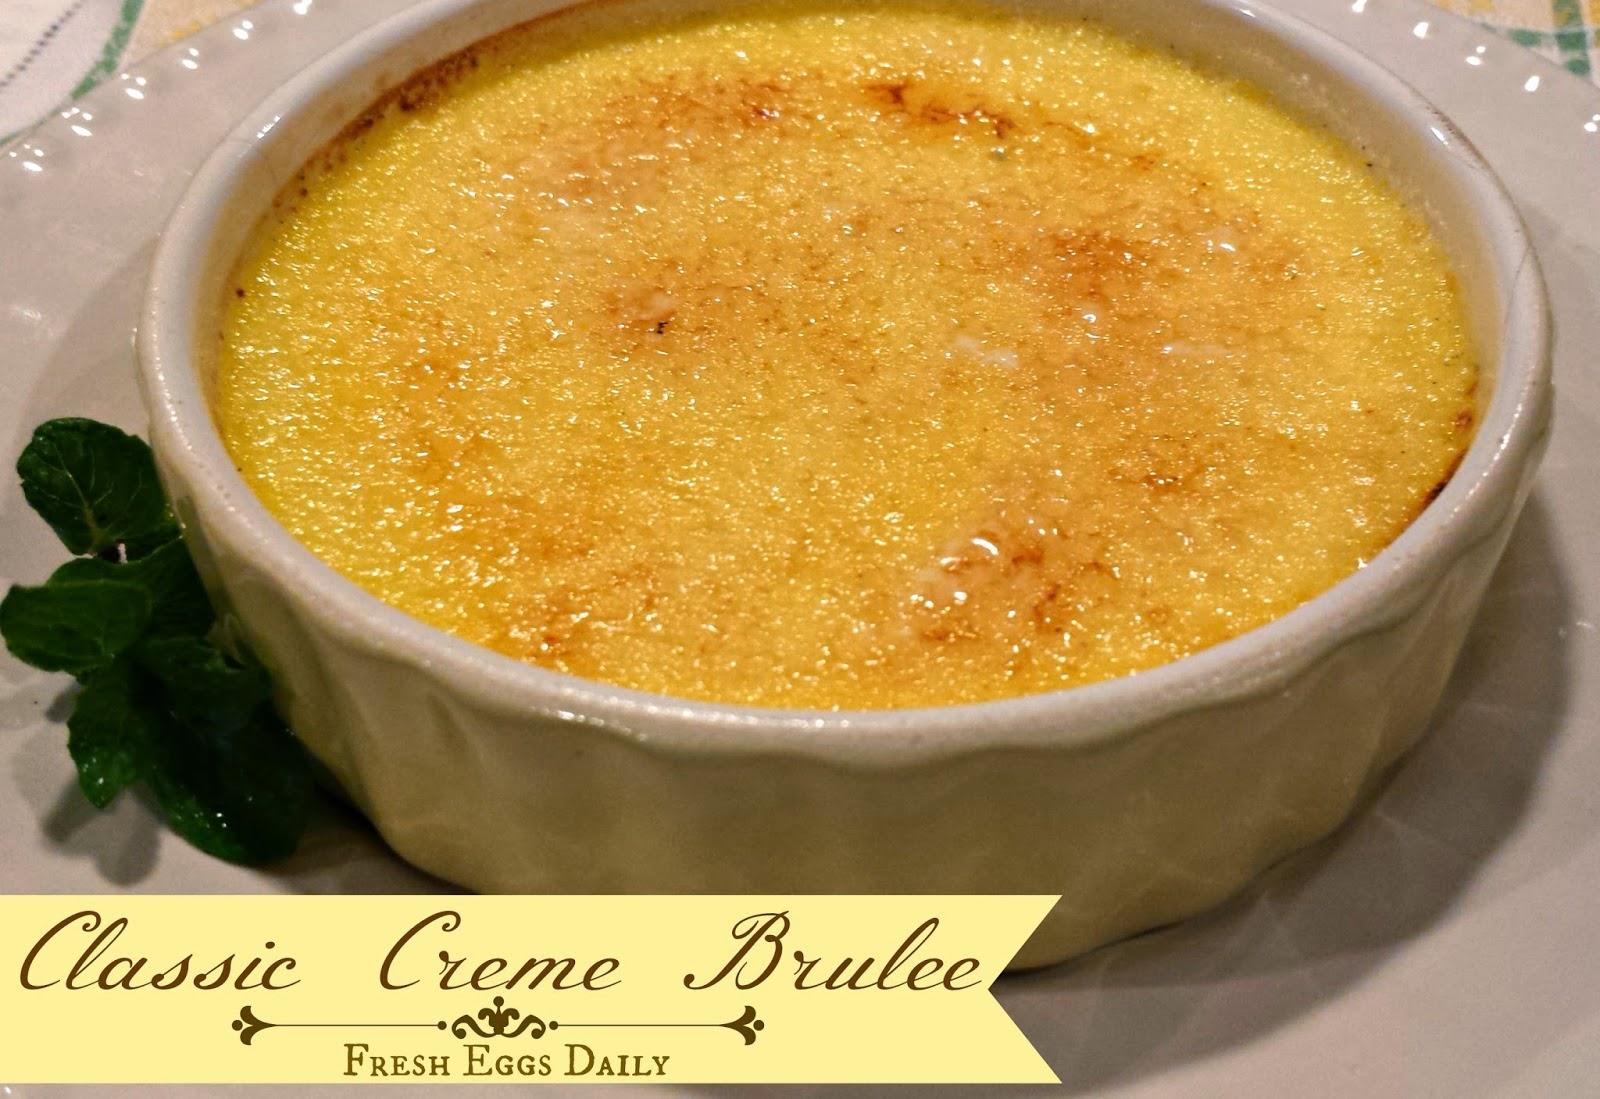 Classic Creme Brulee Fresh Eggs Daily